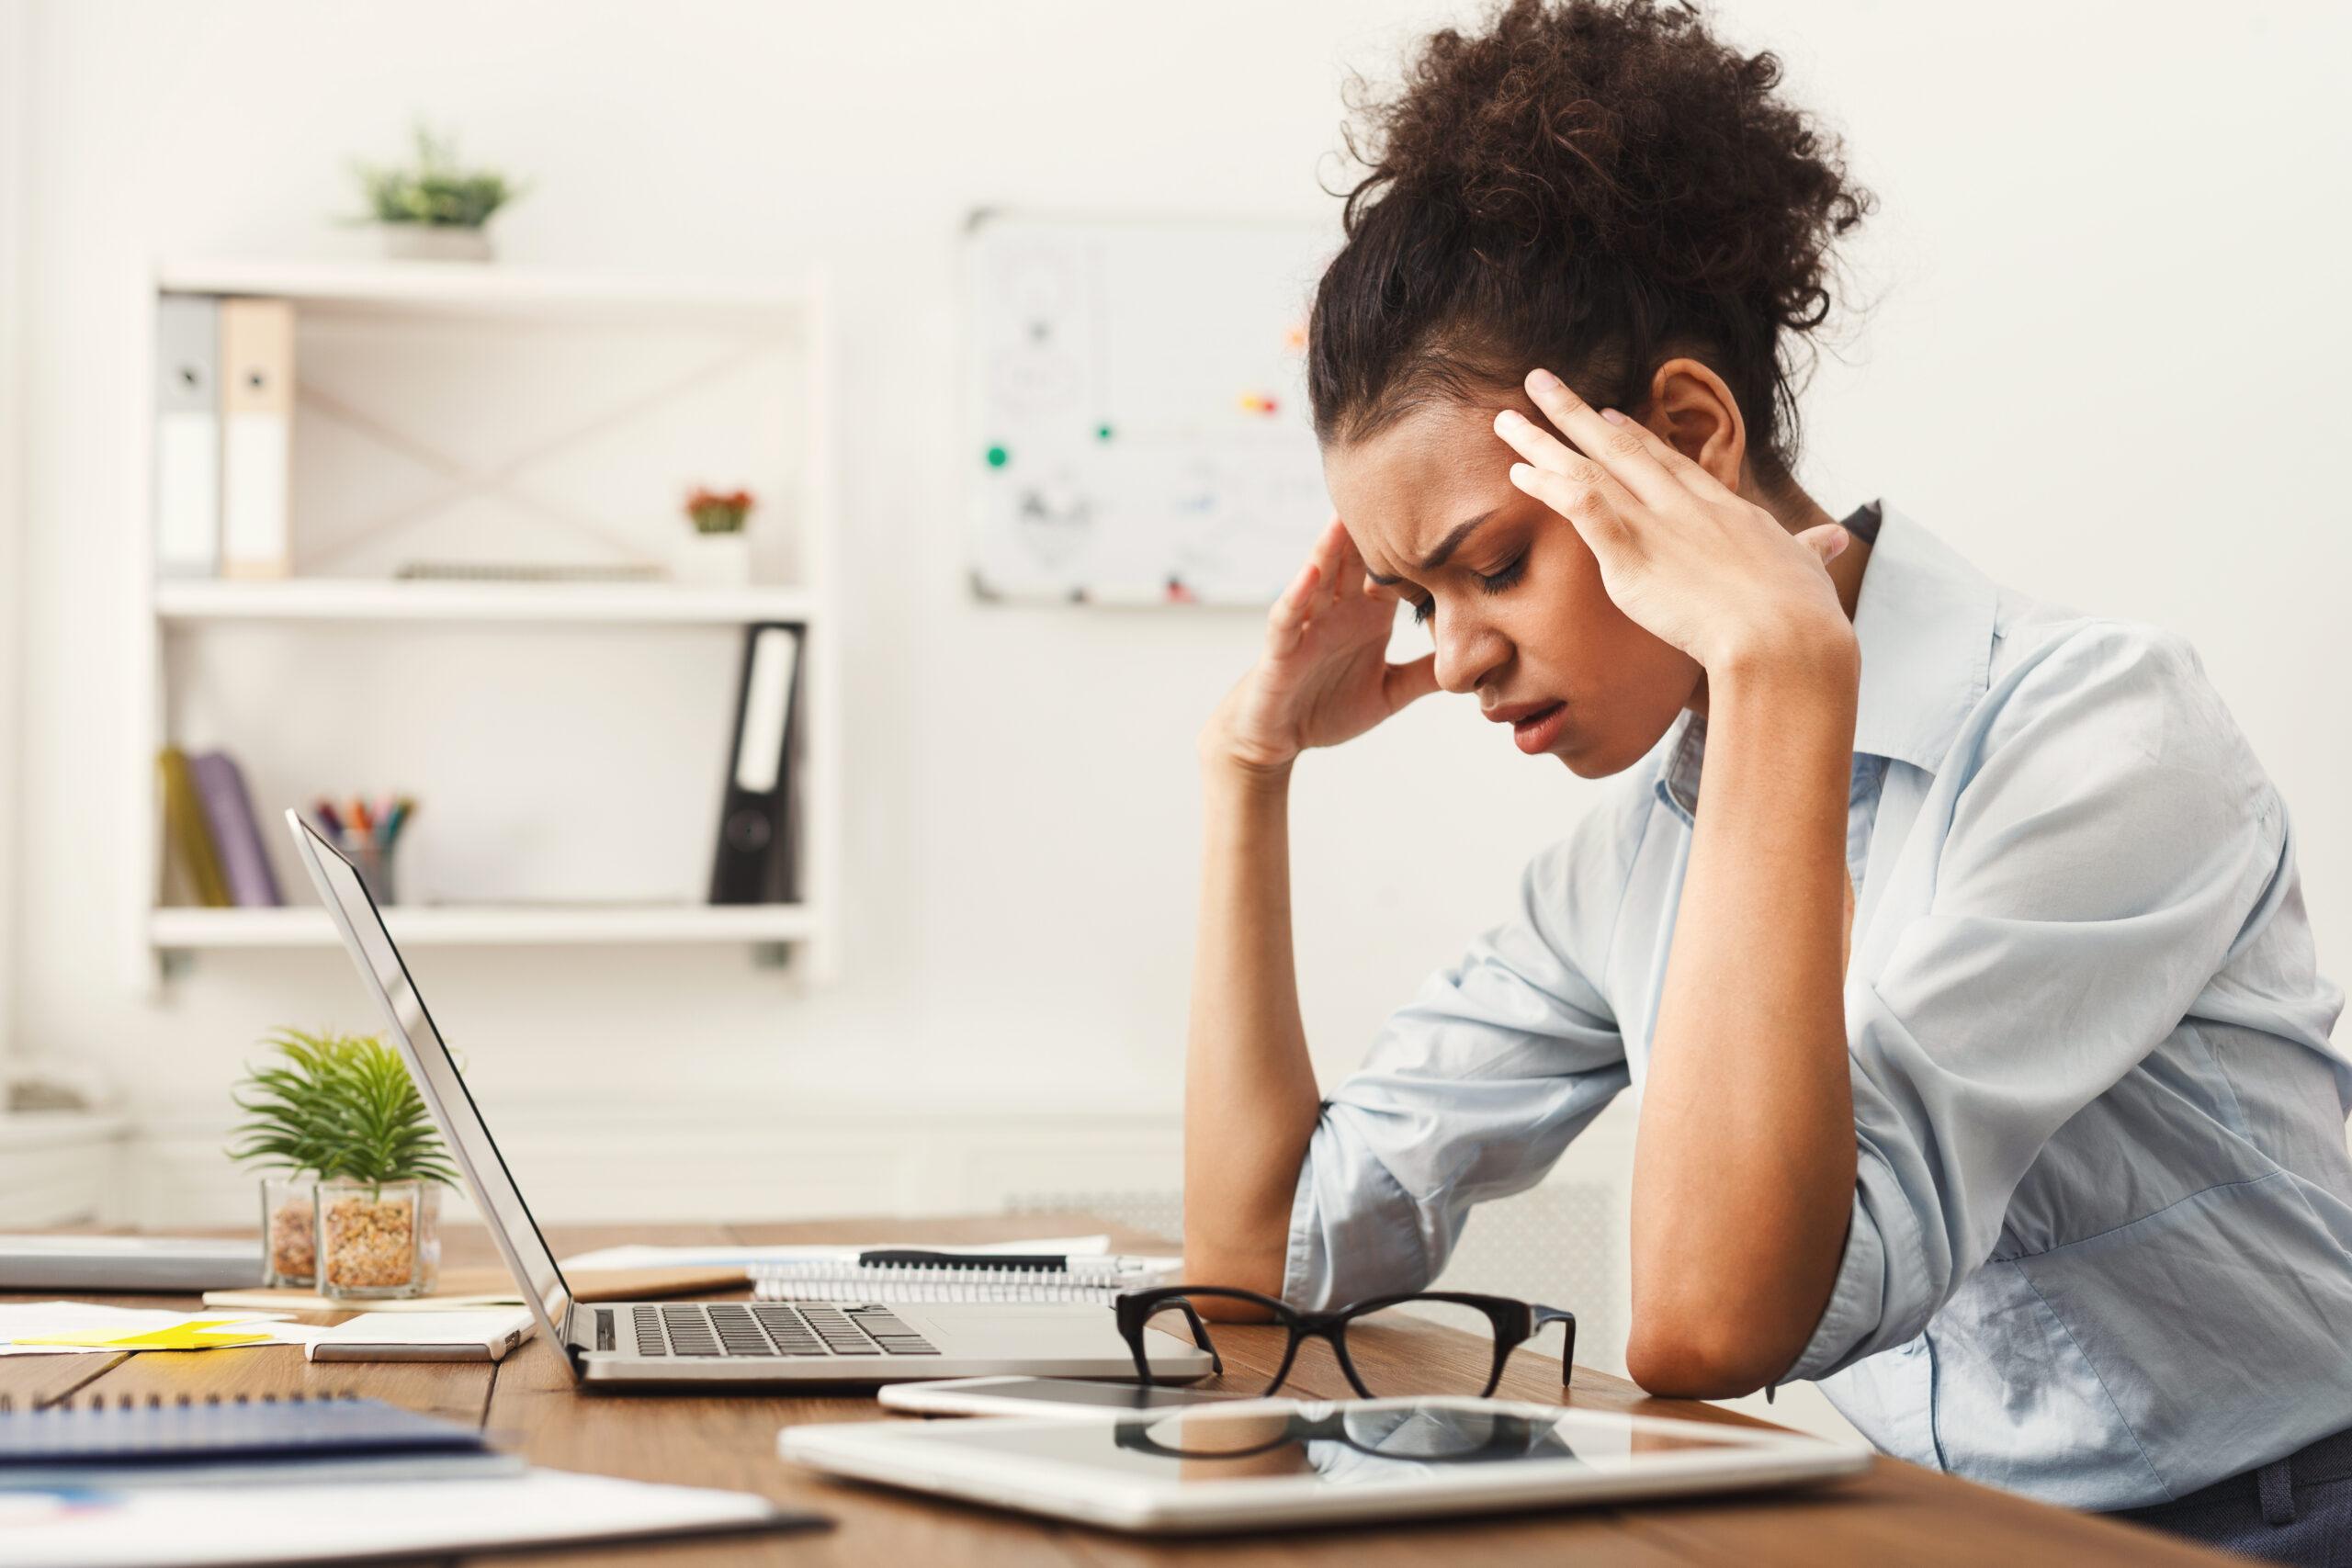 Frustrated Job Seeker